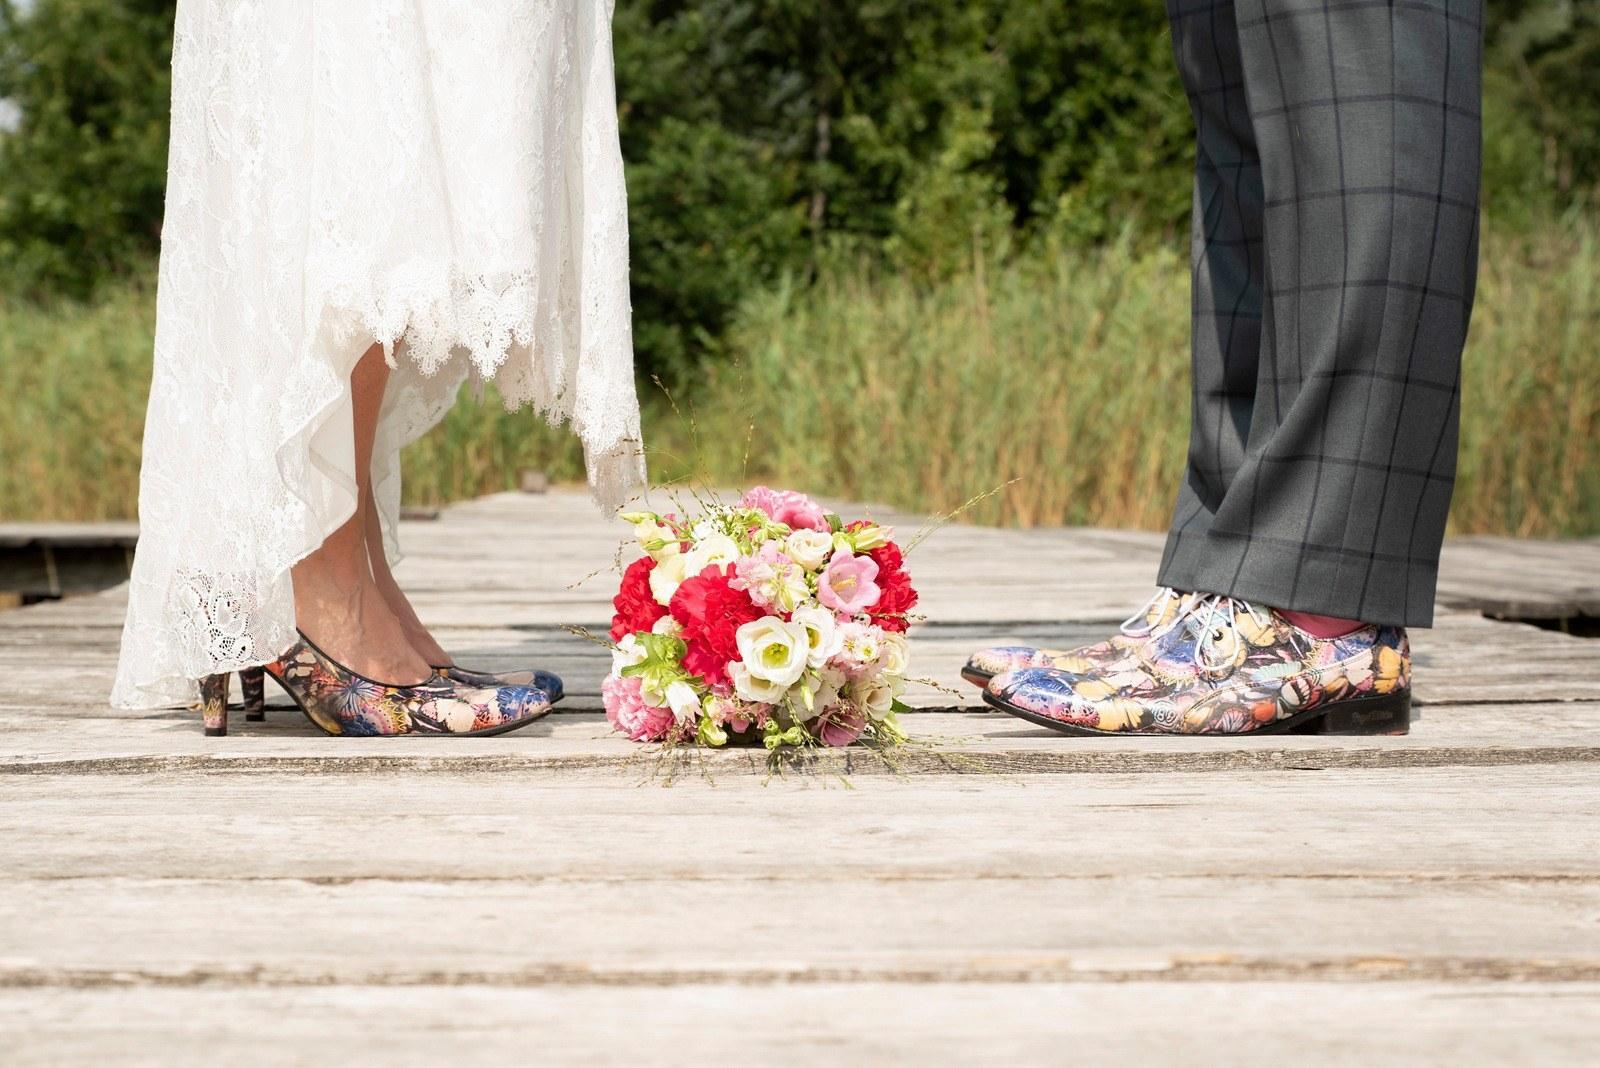 Geruite trouwpak met eigen Peaky Blinders-twist